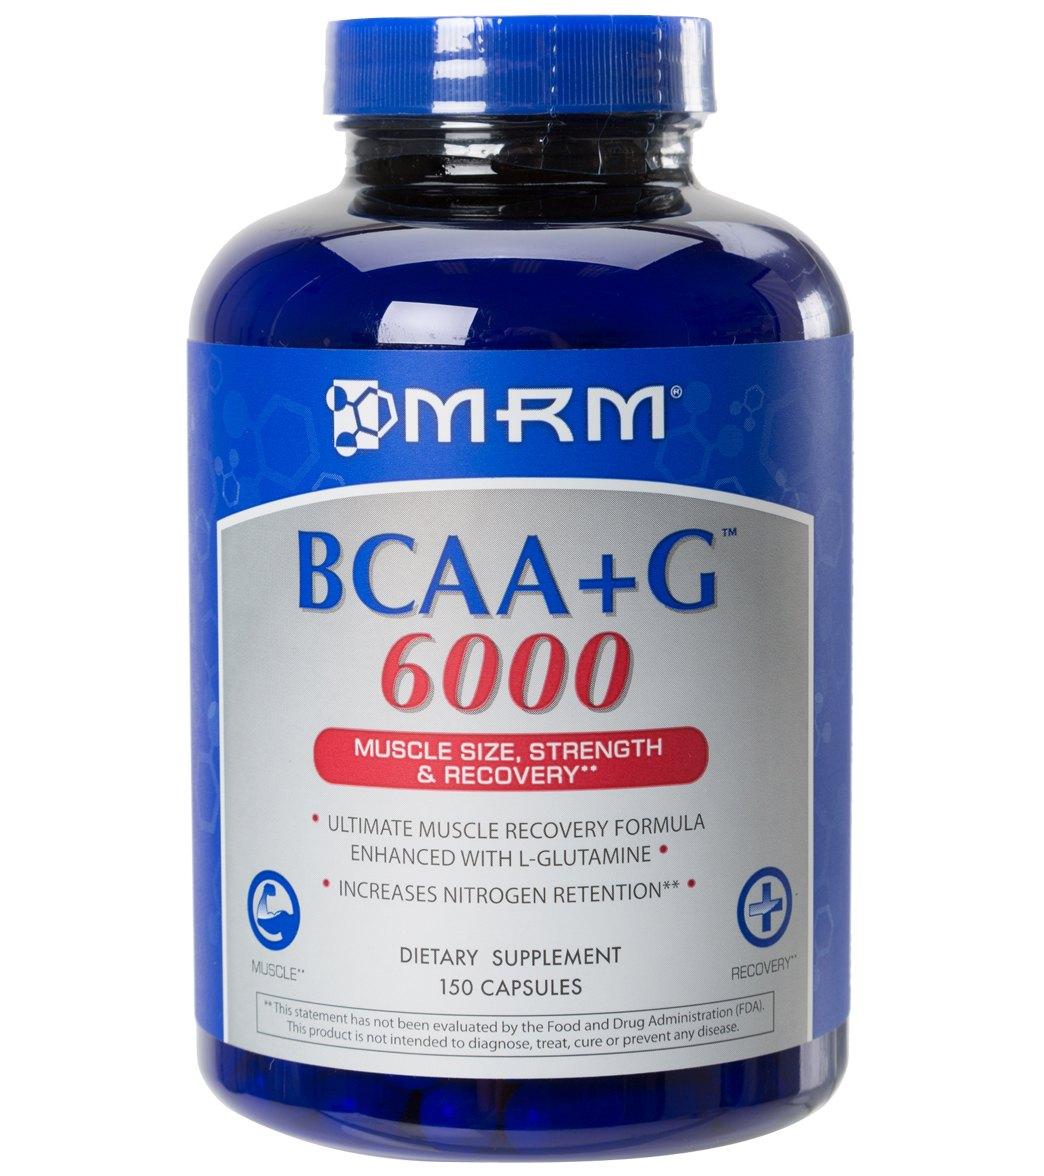 Bcaa 6000 Related Keywords & Suggestions - Bcaa 6000 Long Ta